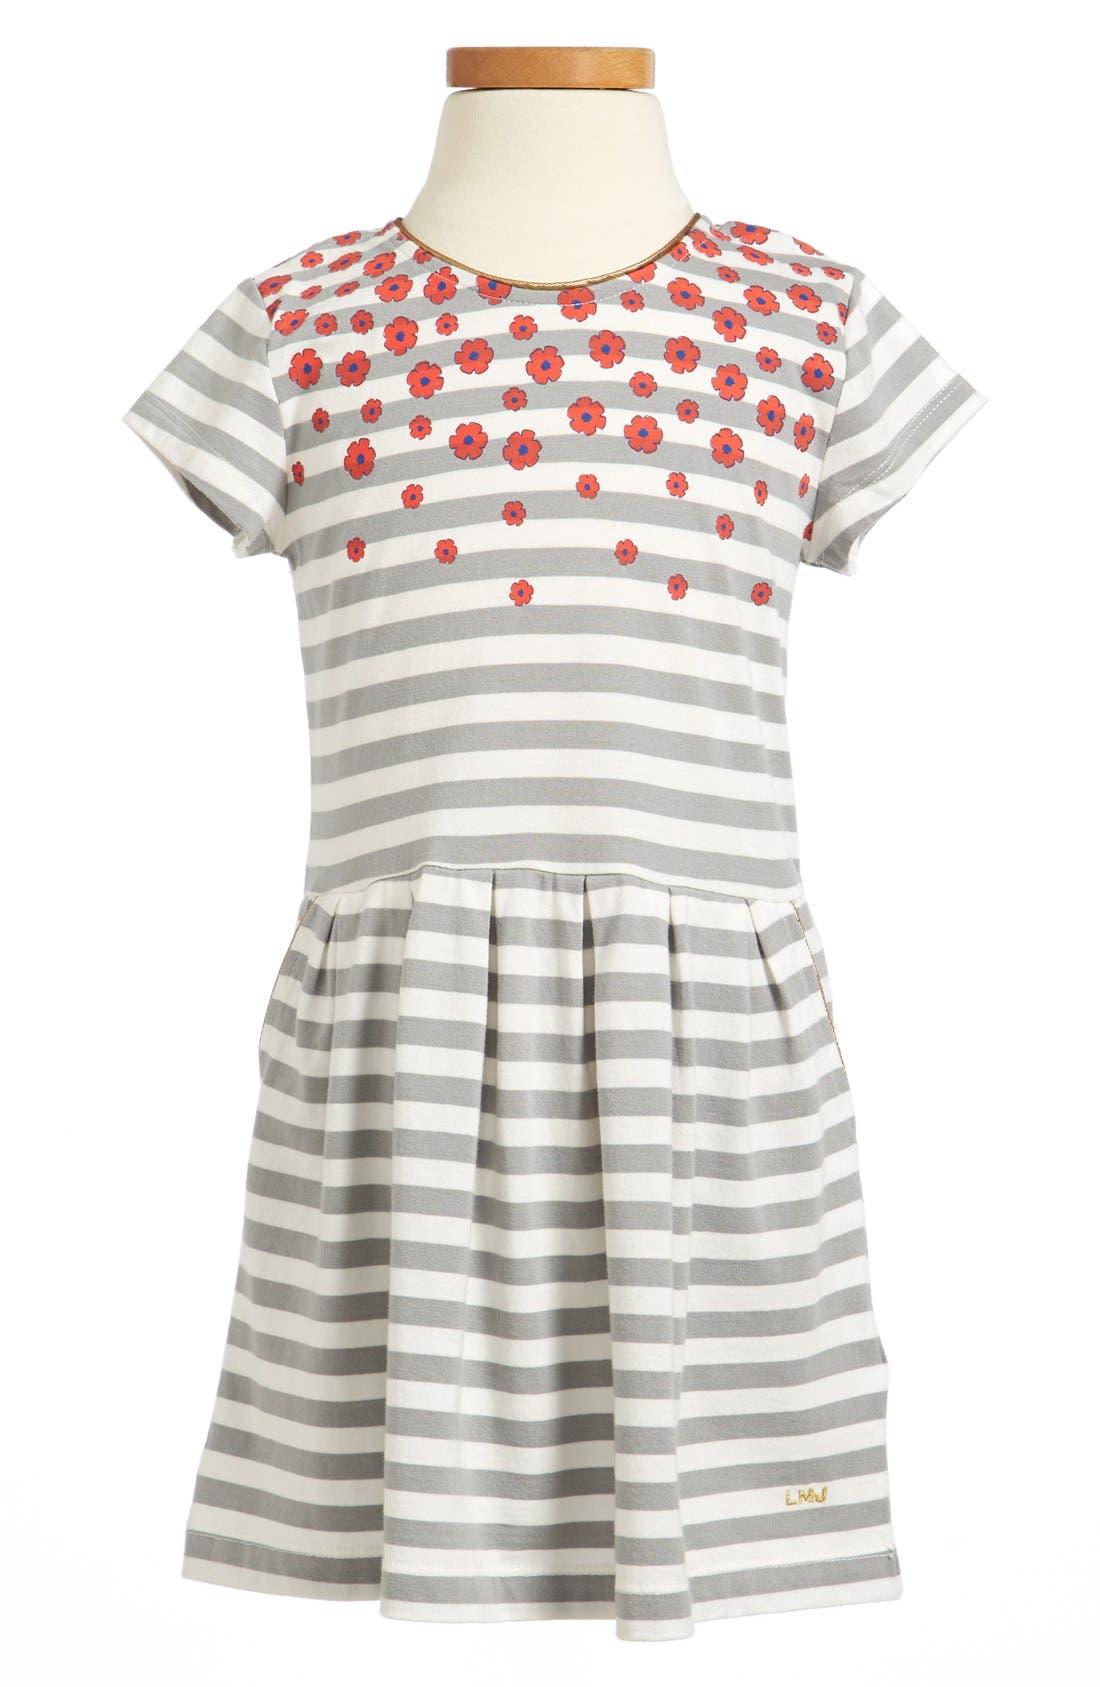 Alternate Image 1 Selected - LITTLE MARC JACOBS Stripe Floral Jersey Dress (Little Girls & Big Girls)